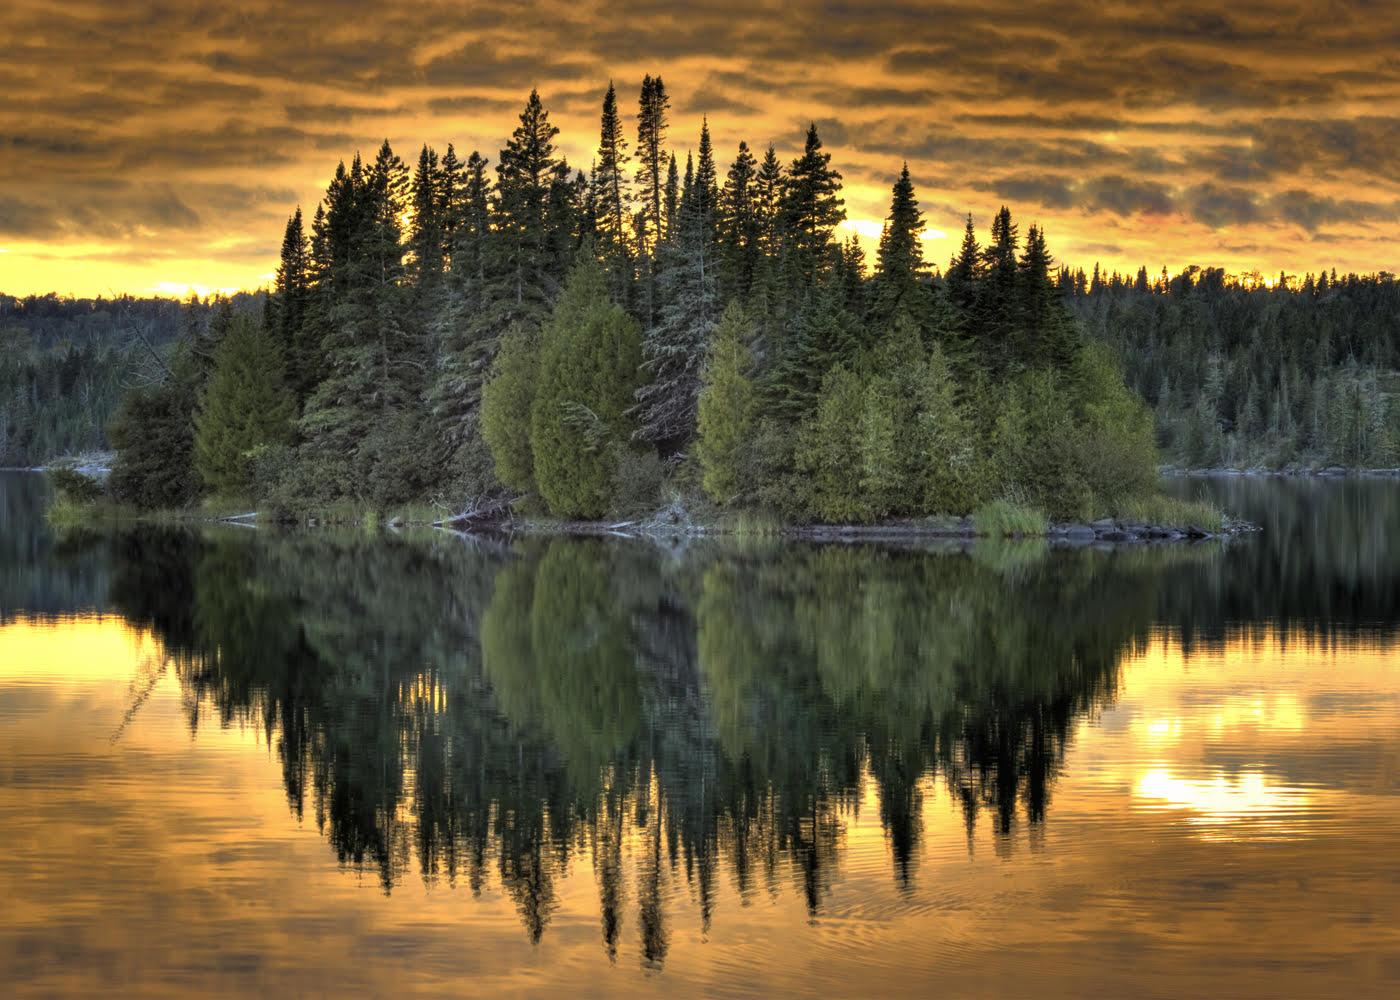 Sea Kayak Isle Royale National Park Michigan Sierra Club